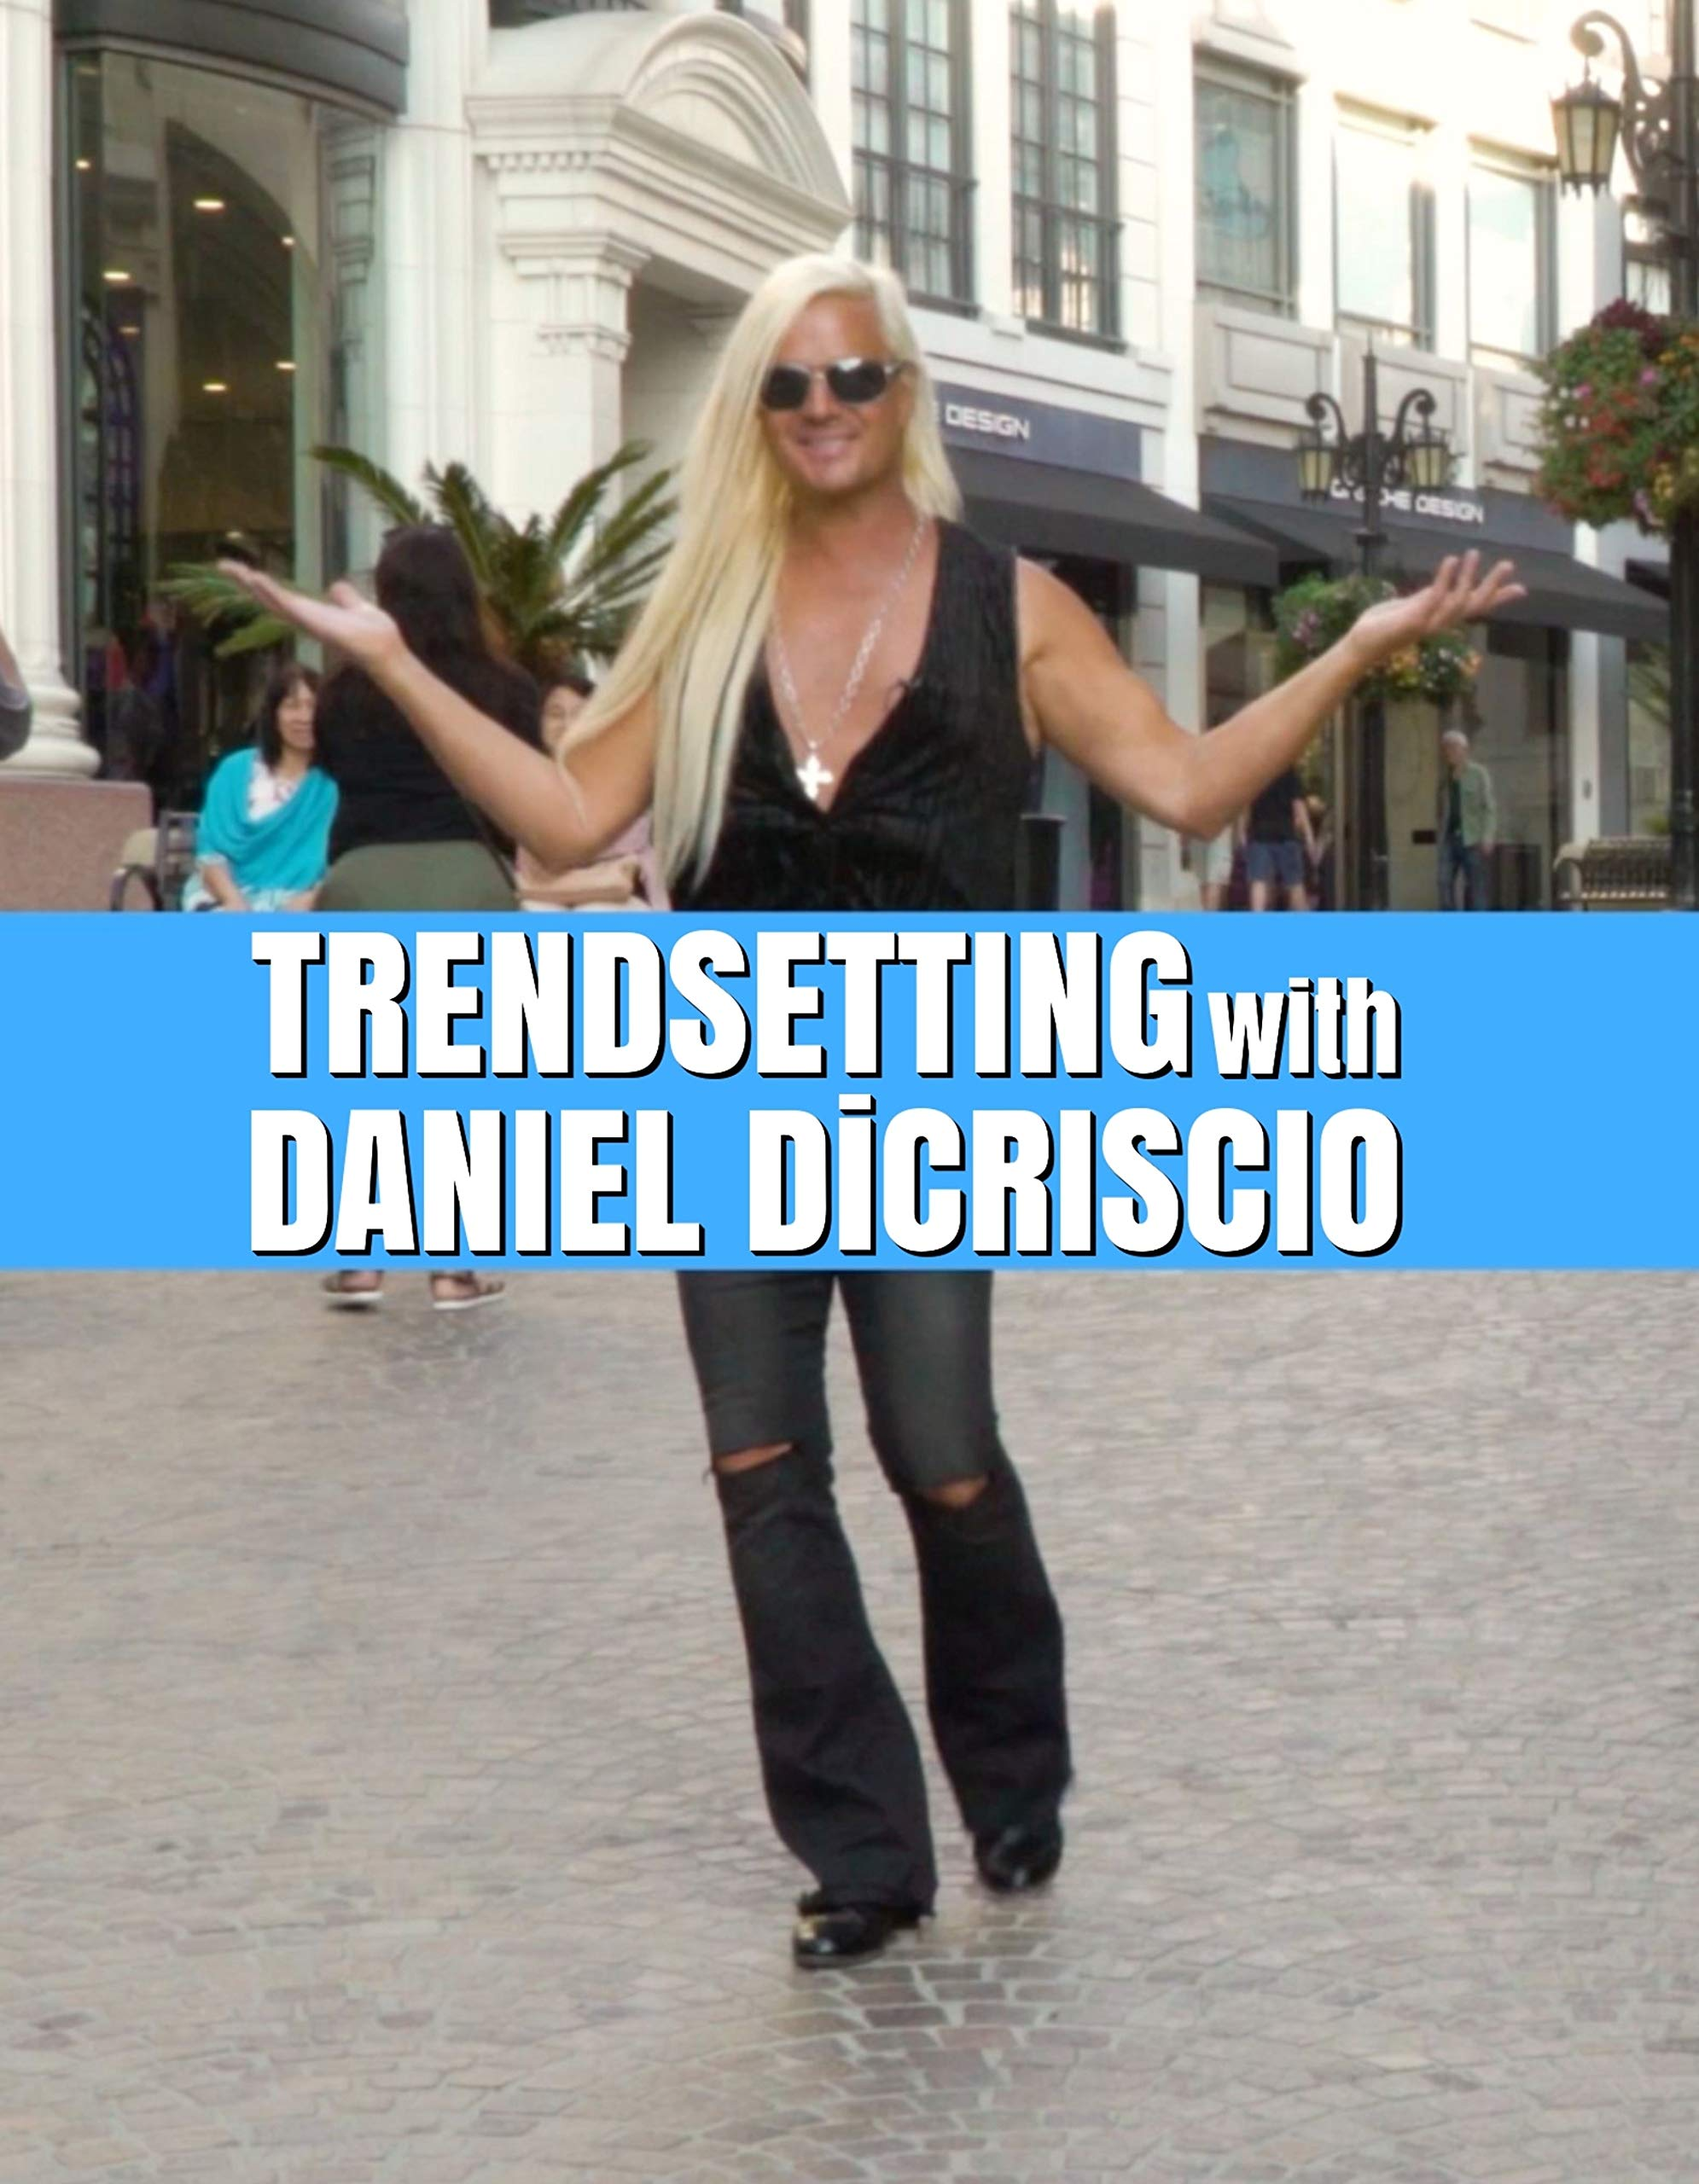 Trendsetting with Daniel DiCriscio